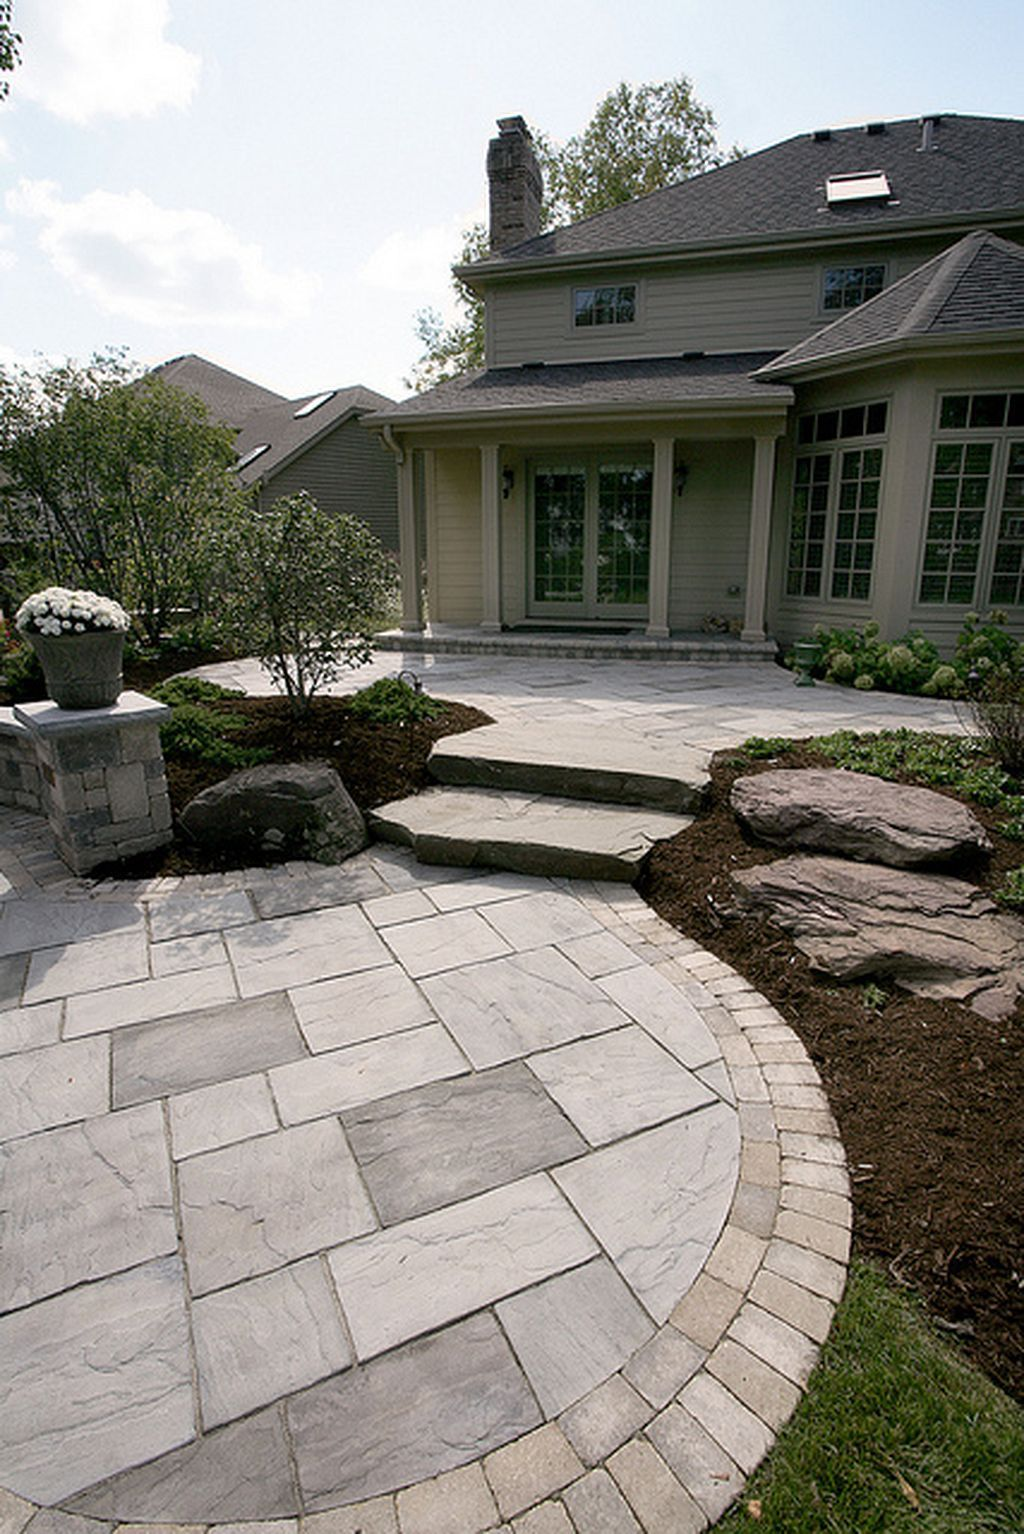 In home garden ideas   Paver Patio Ideas  Patios Backyard and Enclosed patio